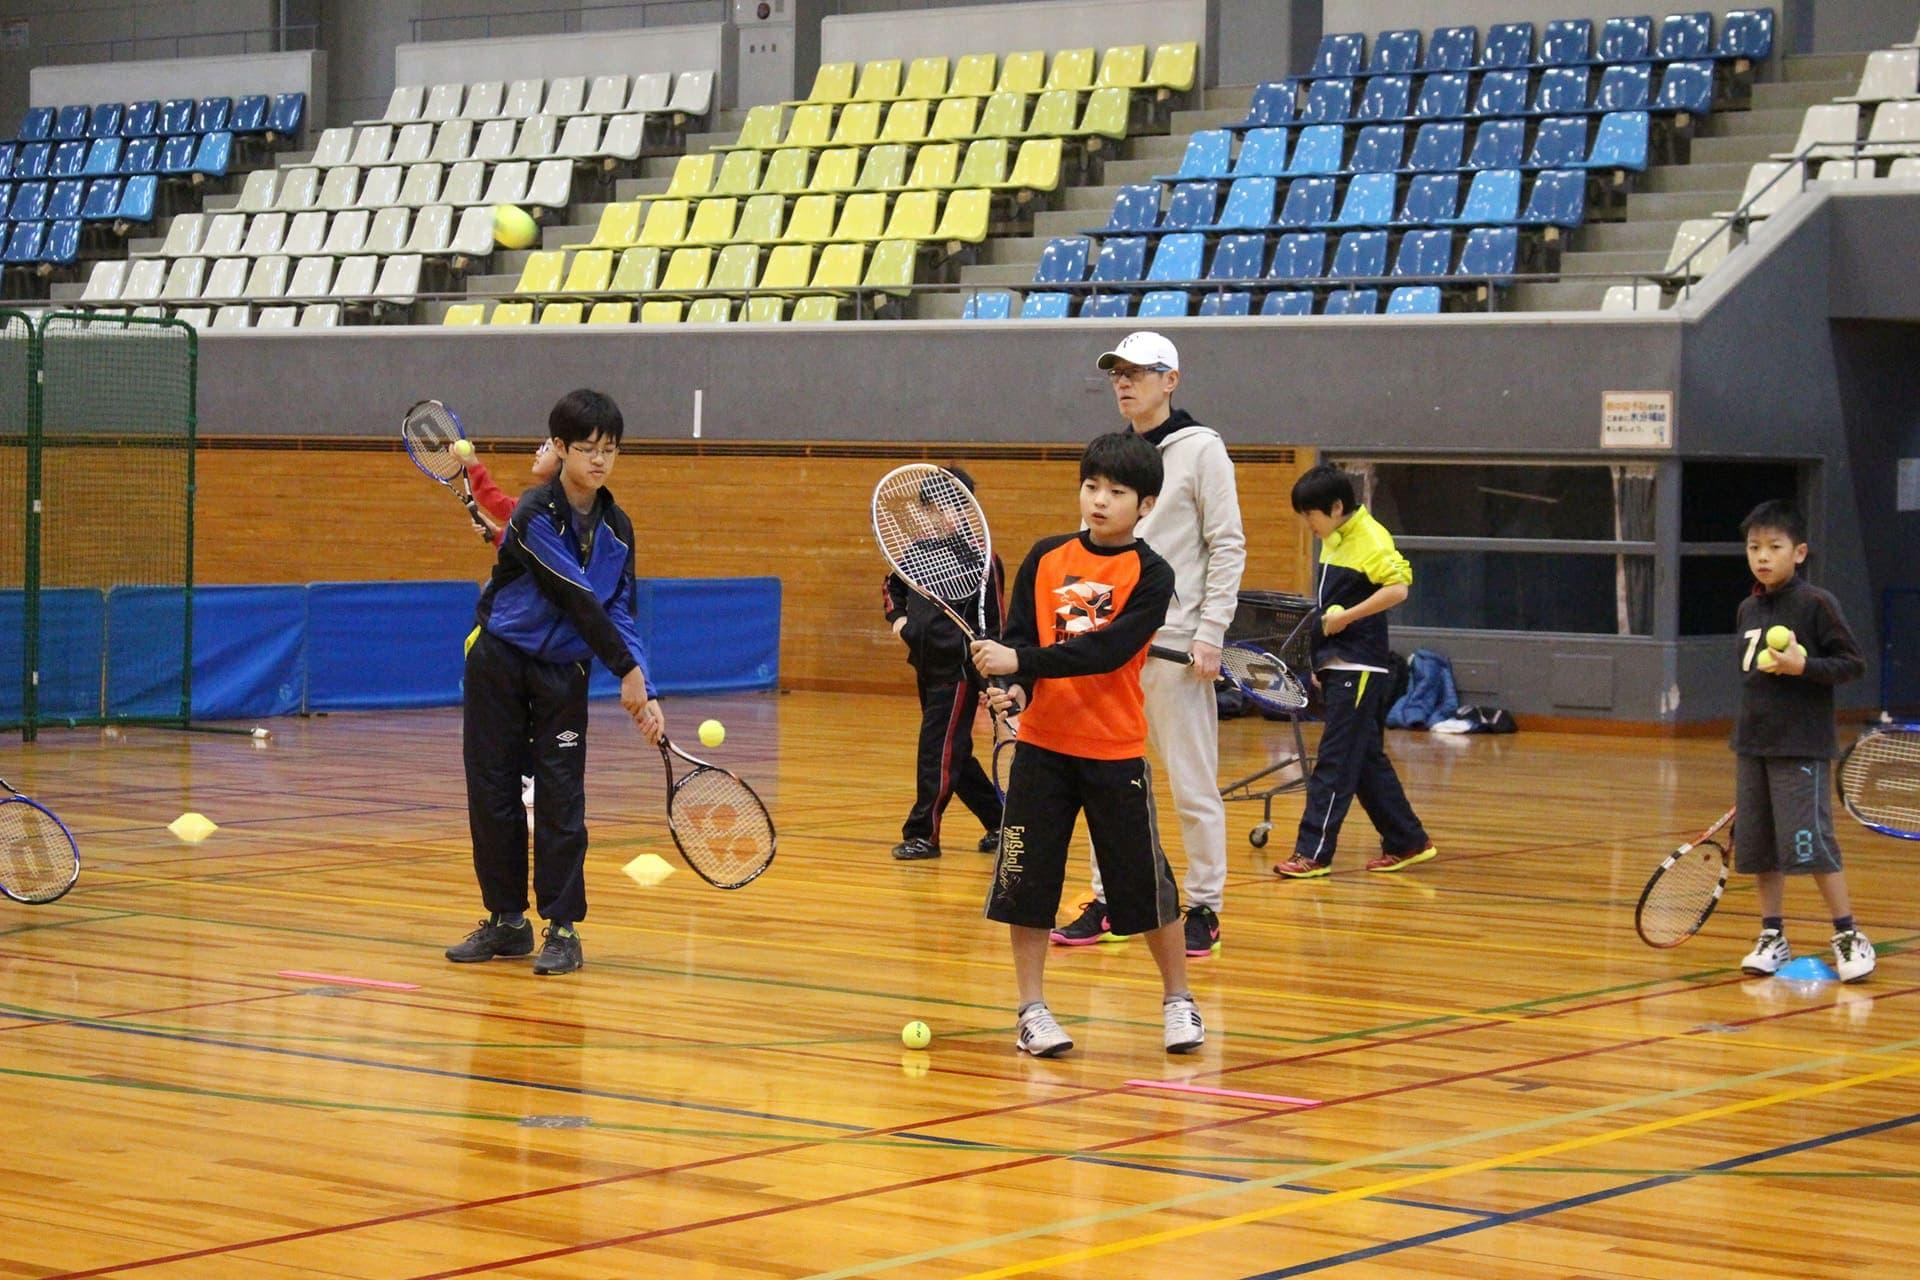 地域健康スポーツ活動支援事業